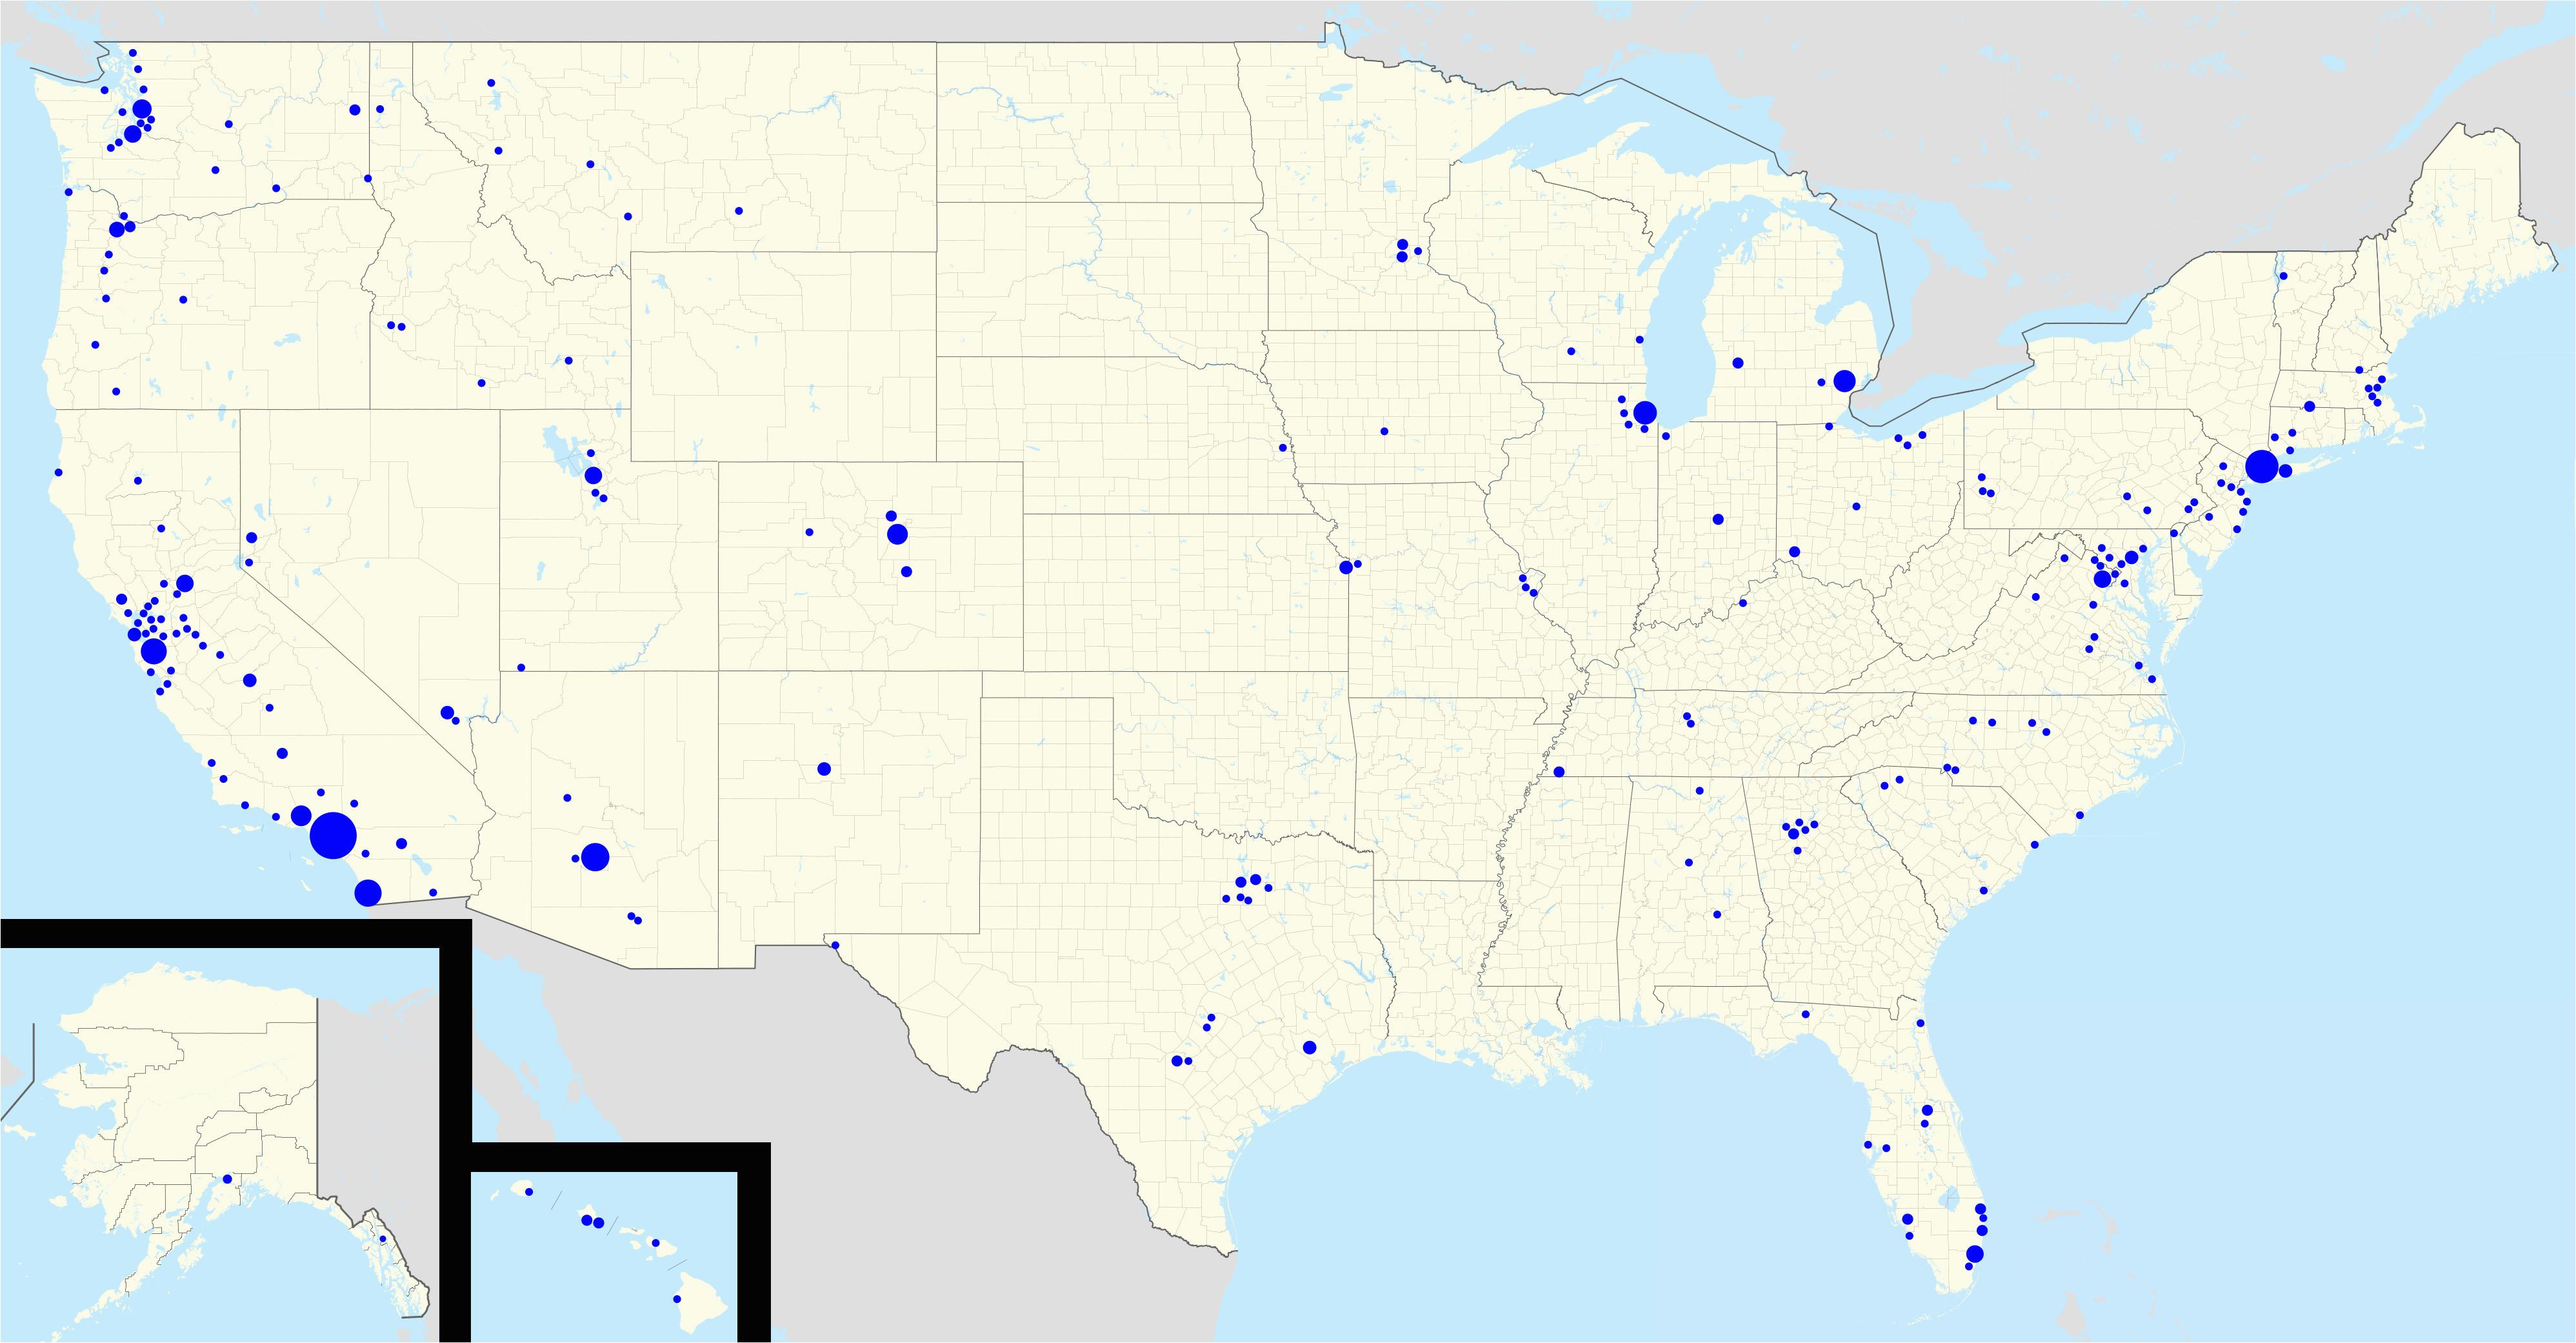 map of costco locations worldwide ettcarworld com